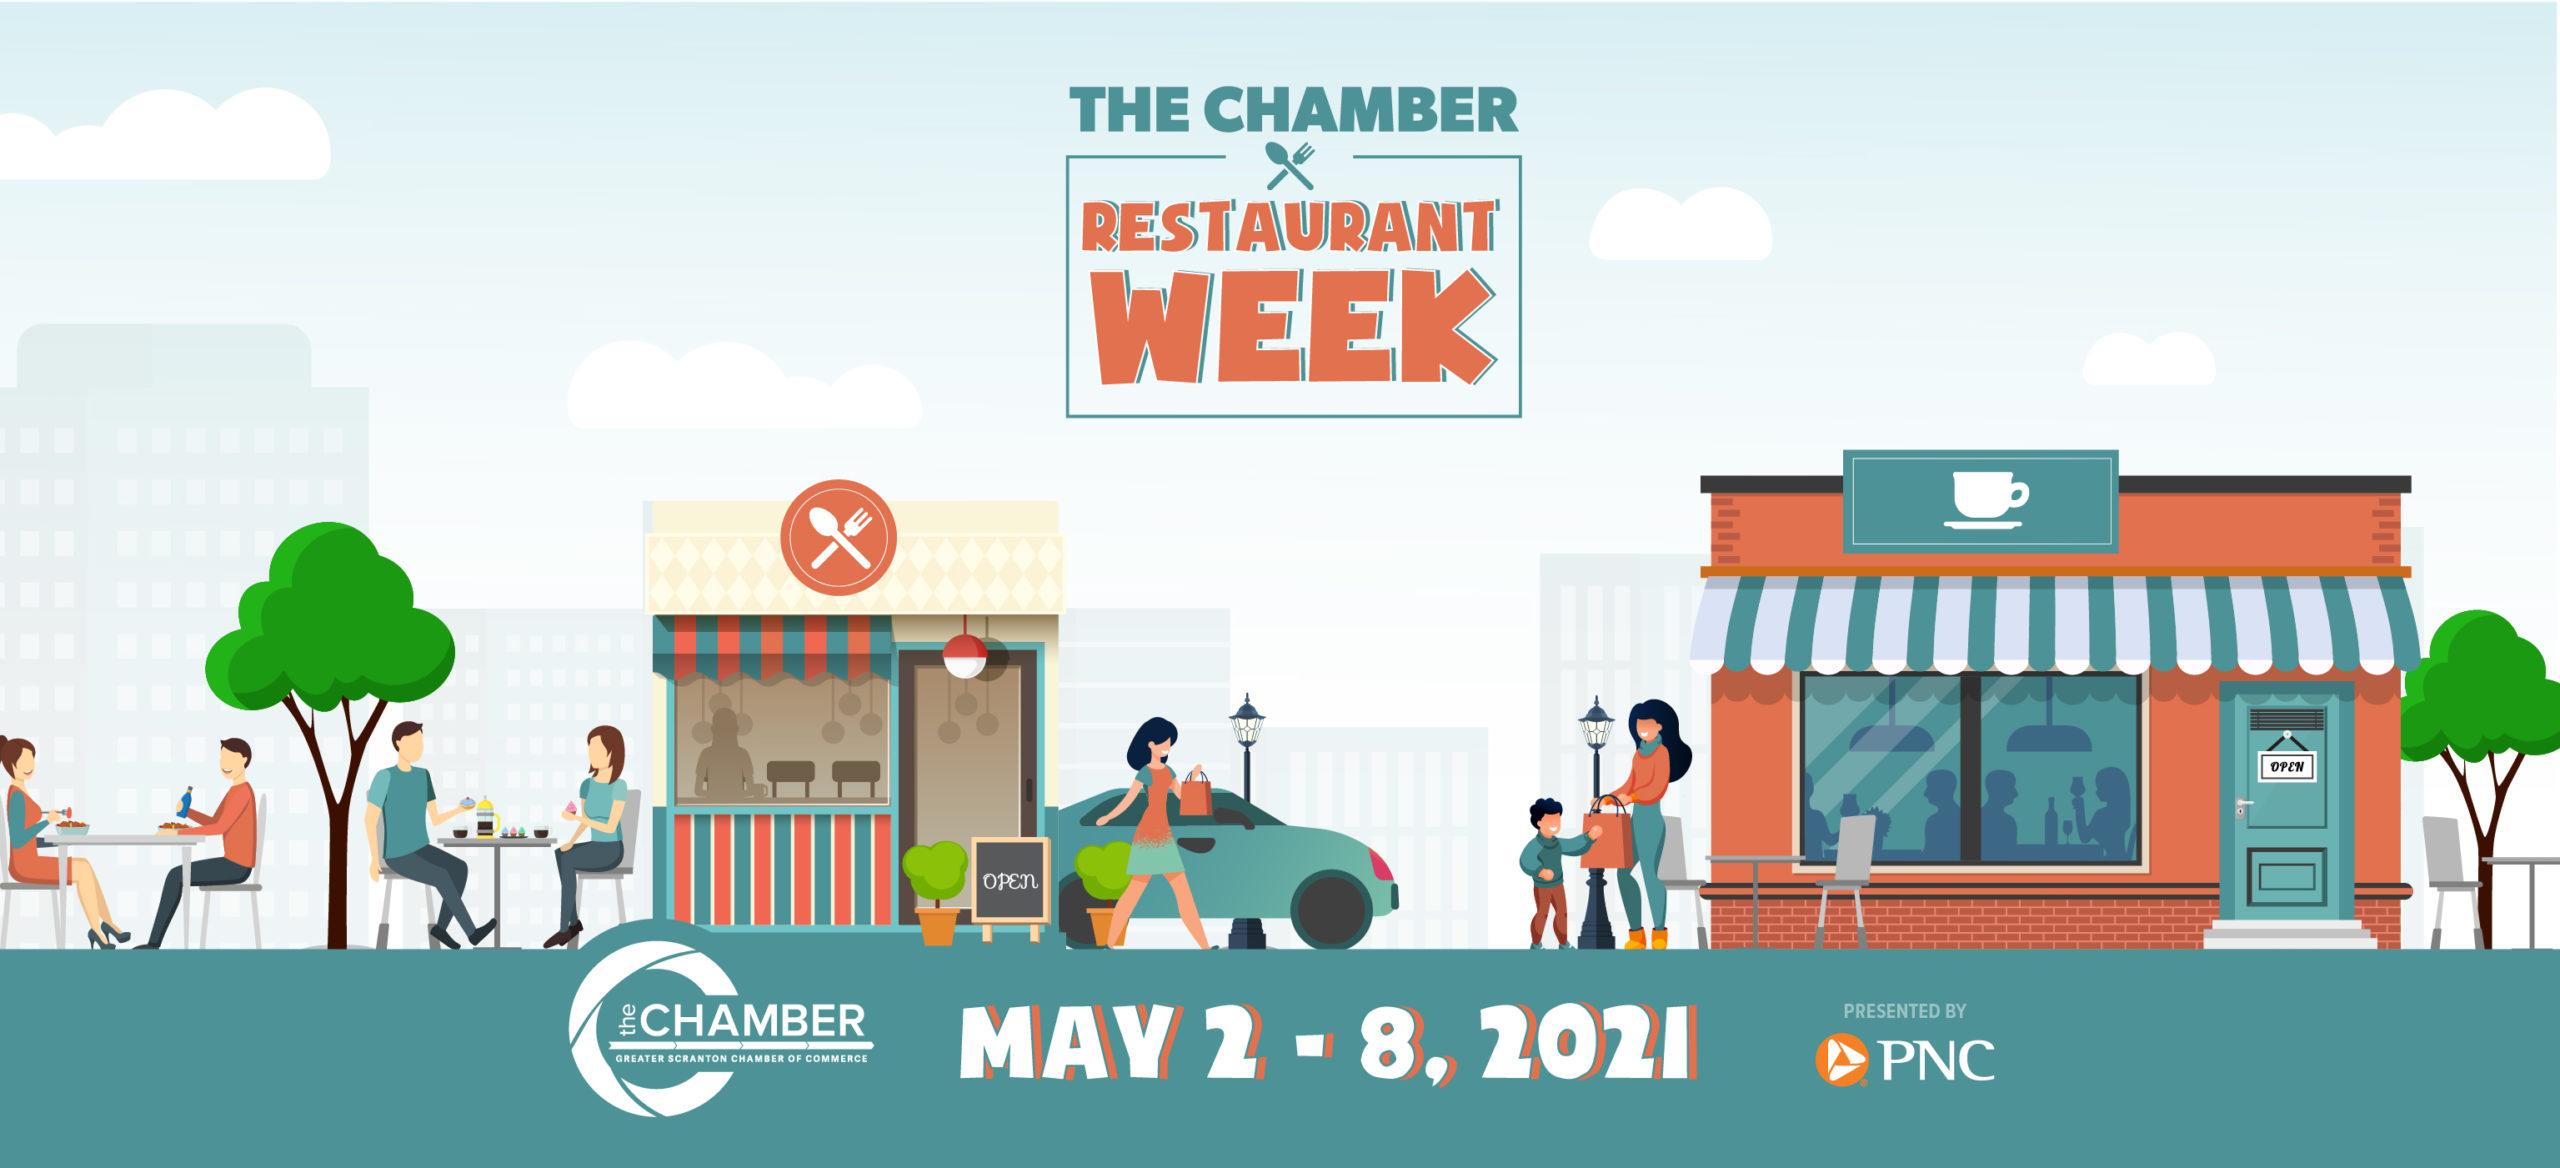 Chamber Restaurant Week